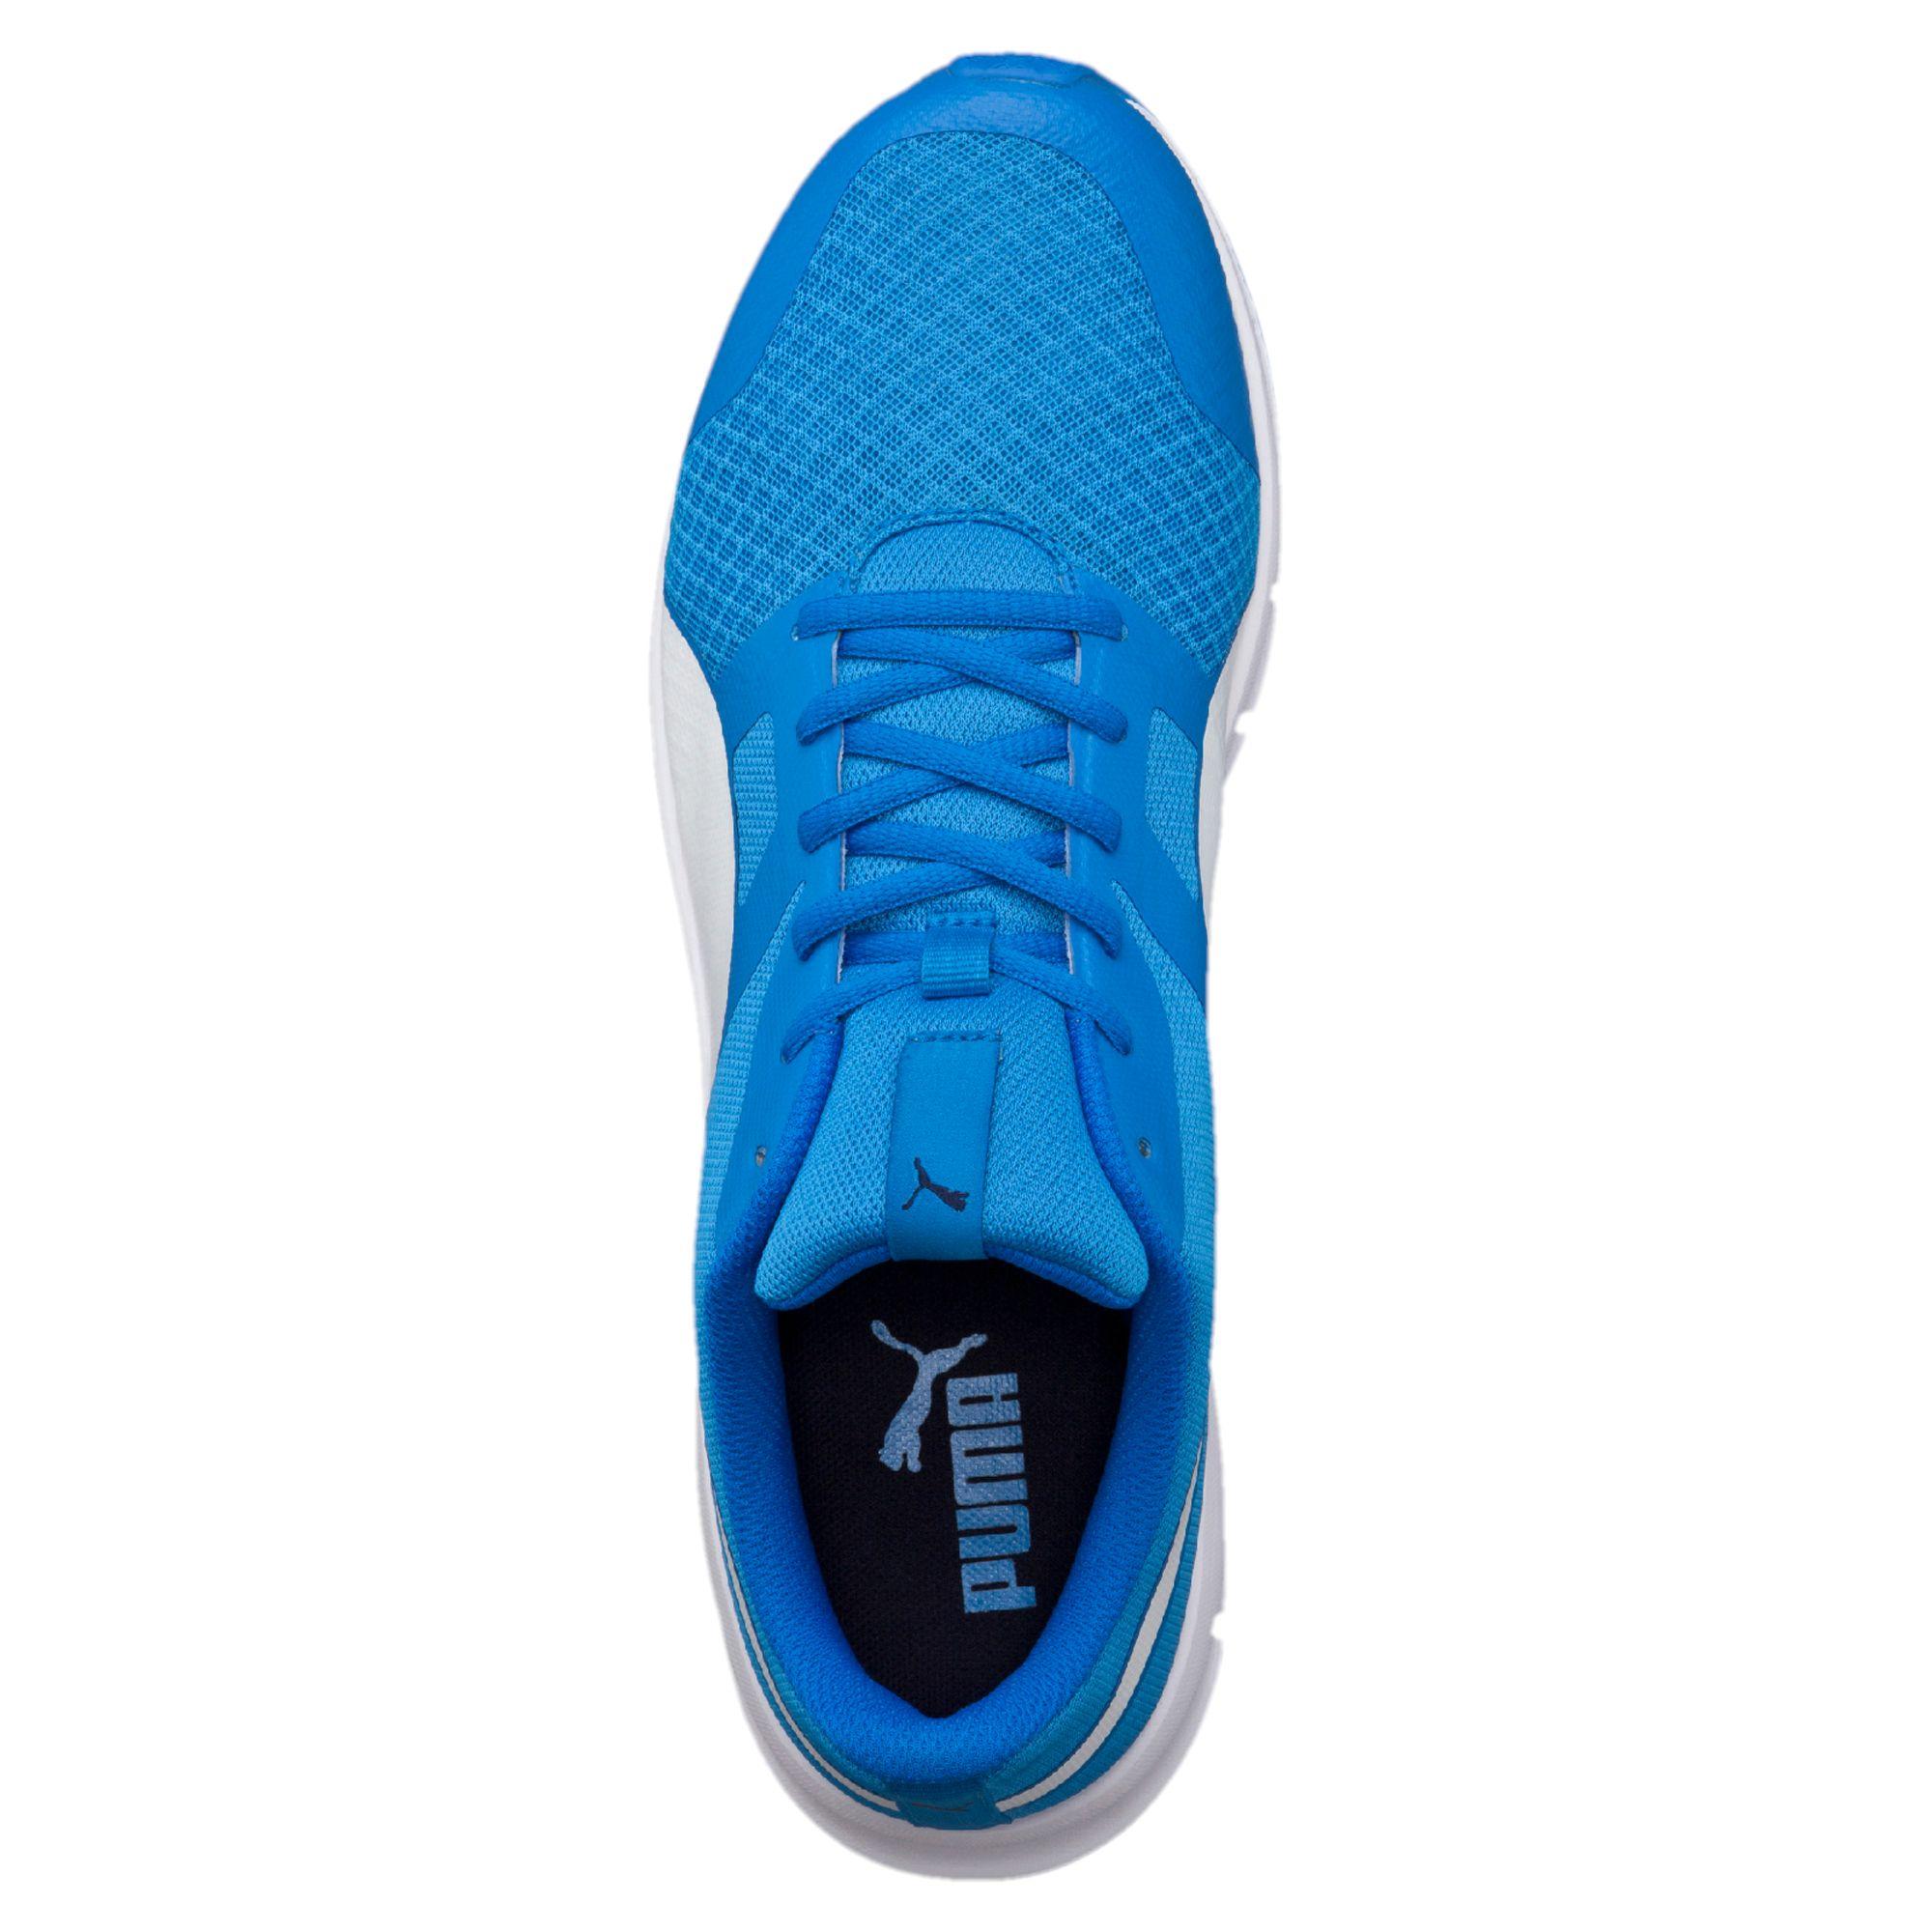 Puma Basket Hommes Neuf Basiques Ebay Flexracer Chaussures rrqHxfw